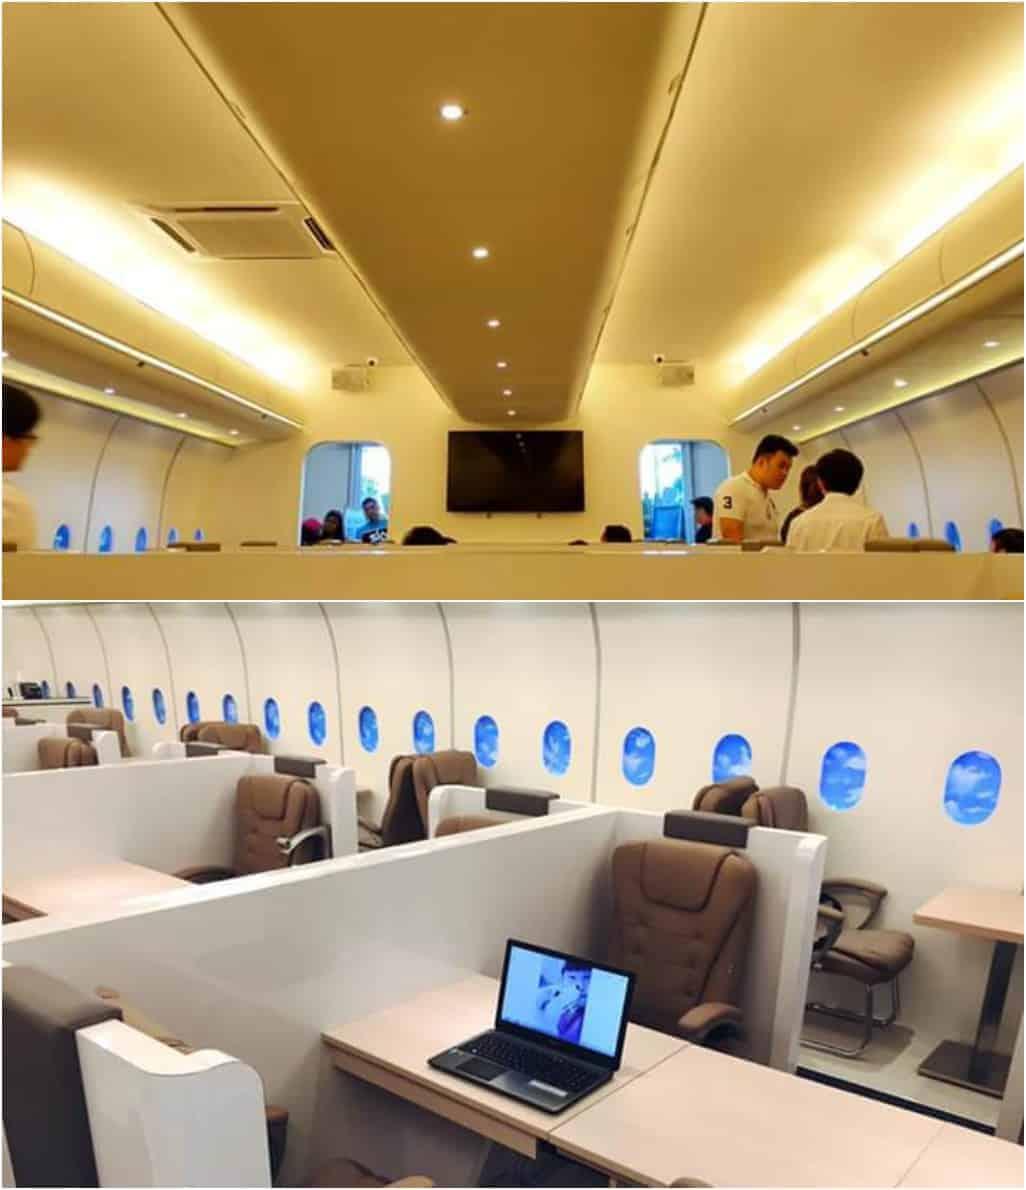 The Dreamliner Airways Café